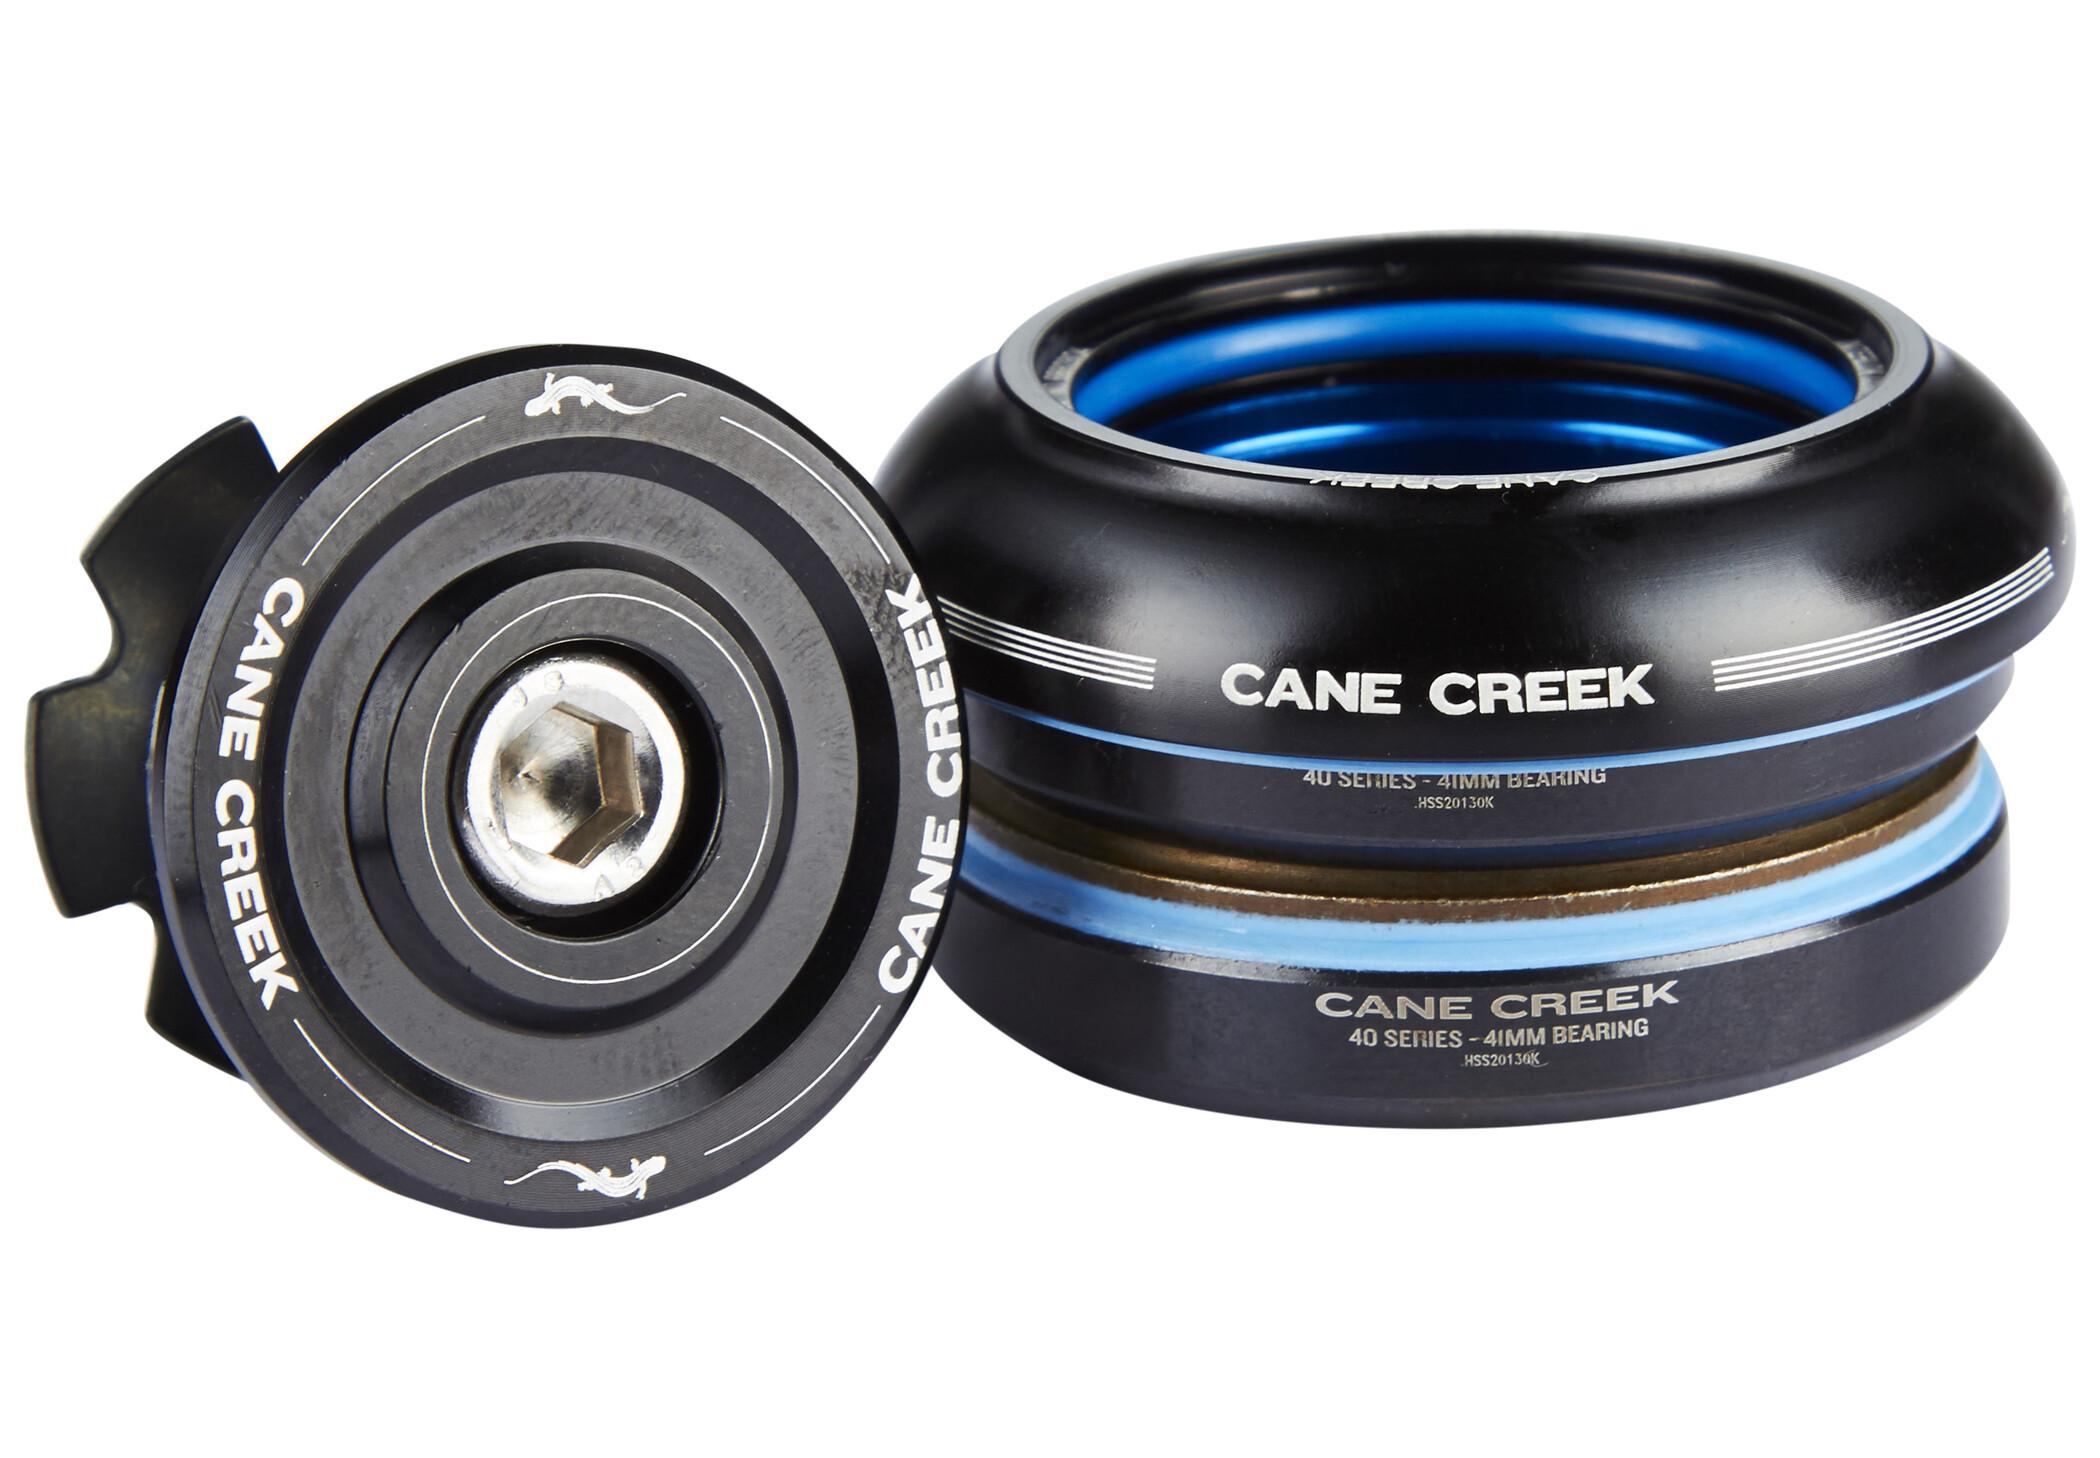 Cane Creek 40 Styrfitting Kort IS41/28.6 I IS41/30, black | Styrfittings